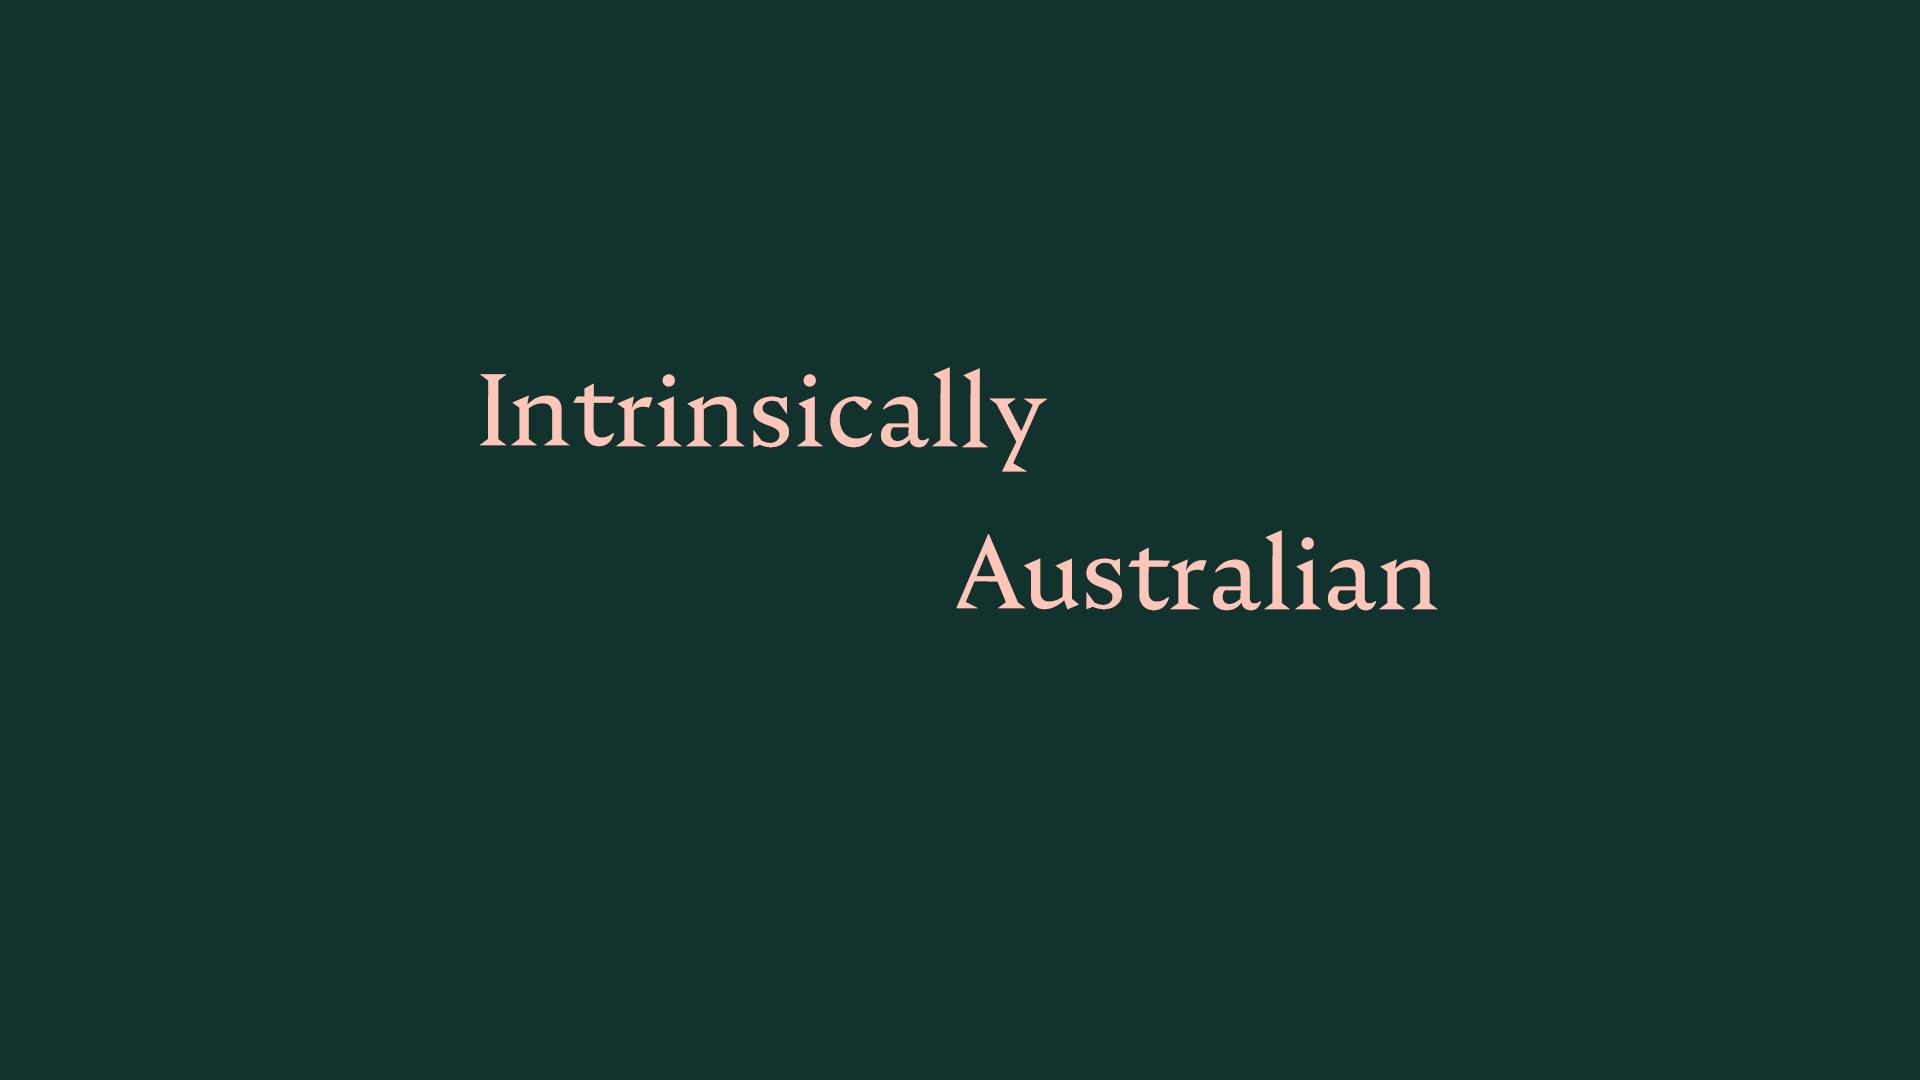 australain.jpg